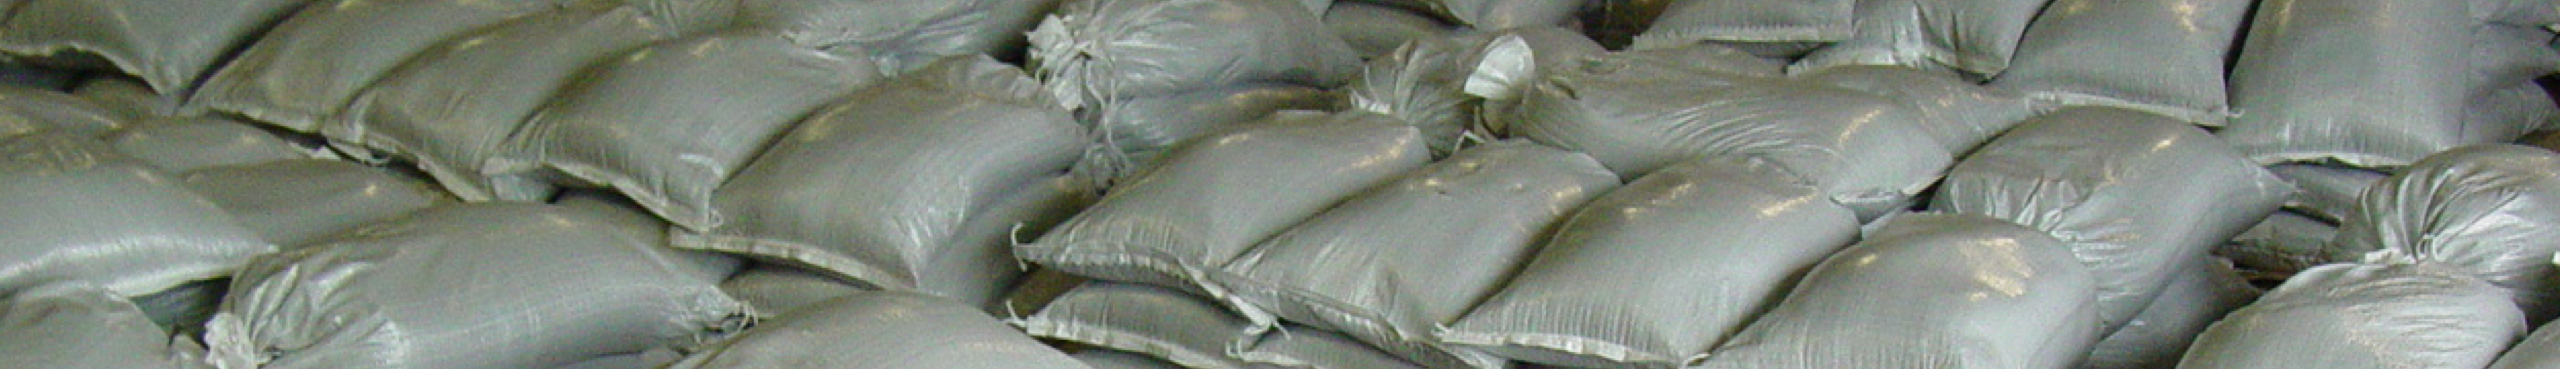 Extrusion Coated Polypropylene Sandbags